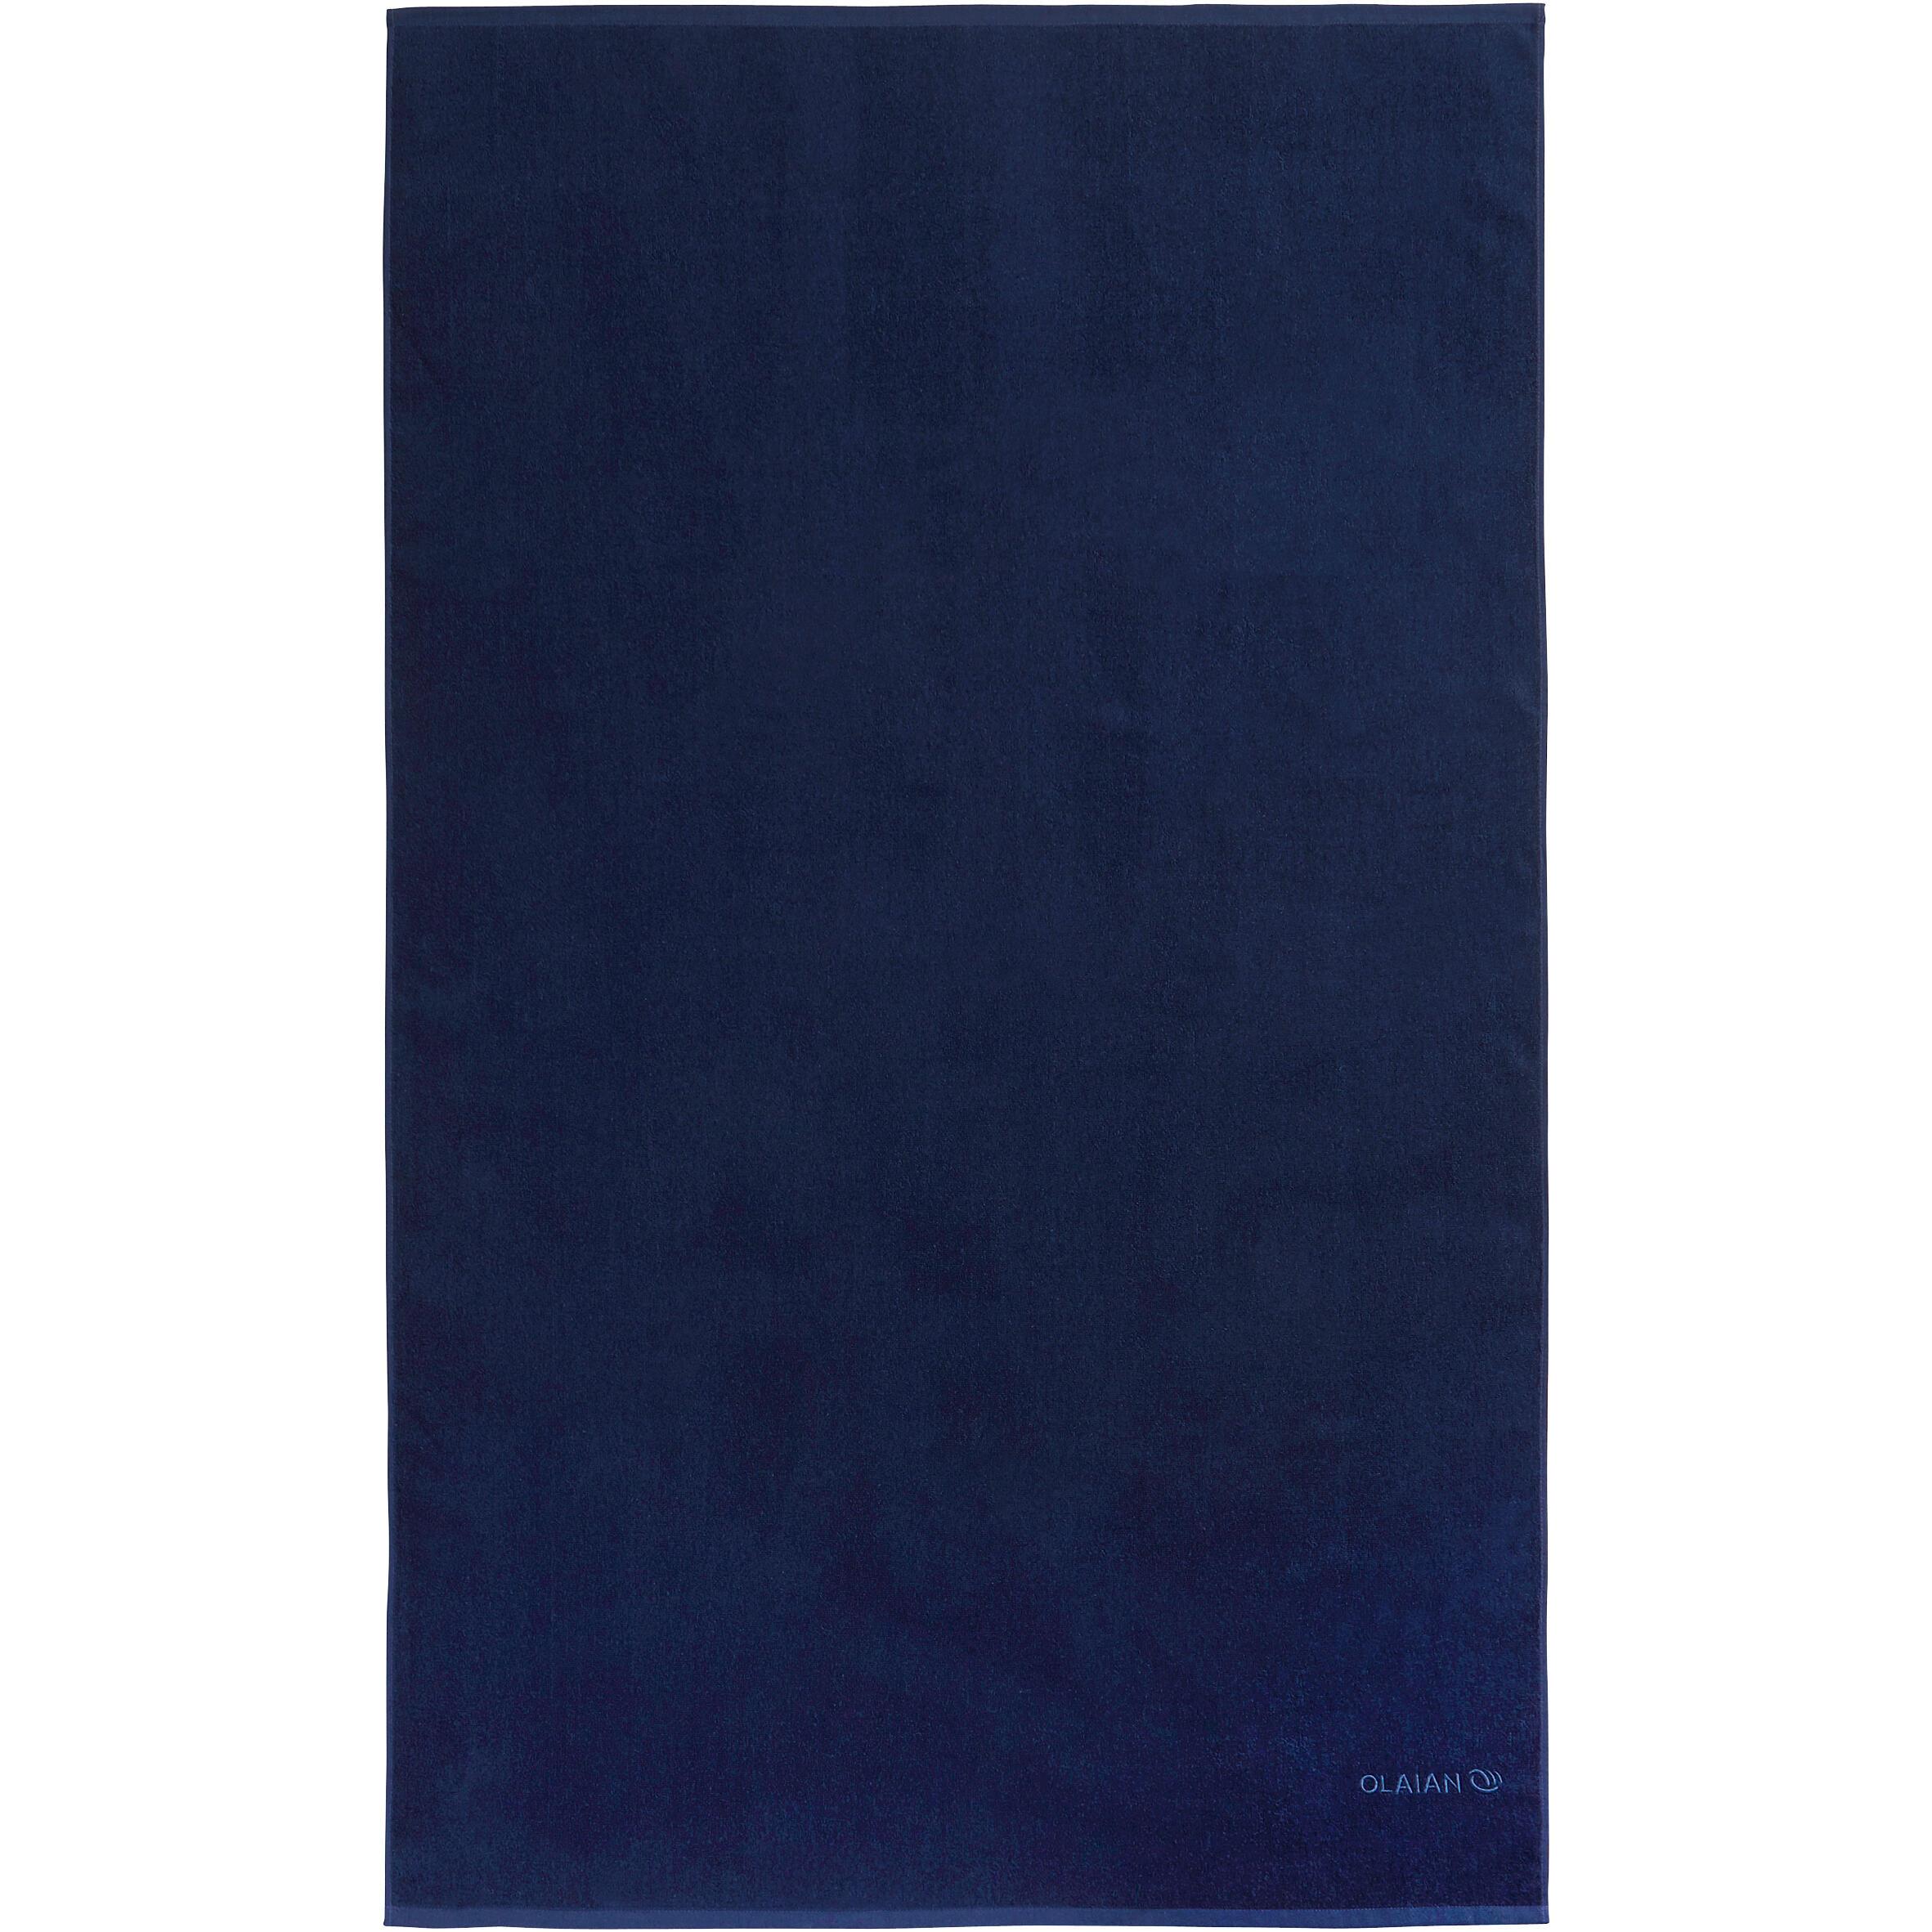 TOALLA Basic G Azul oscuro 145 x 85 cm